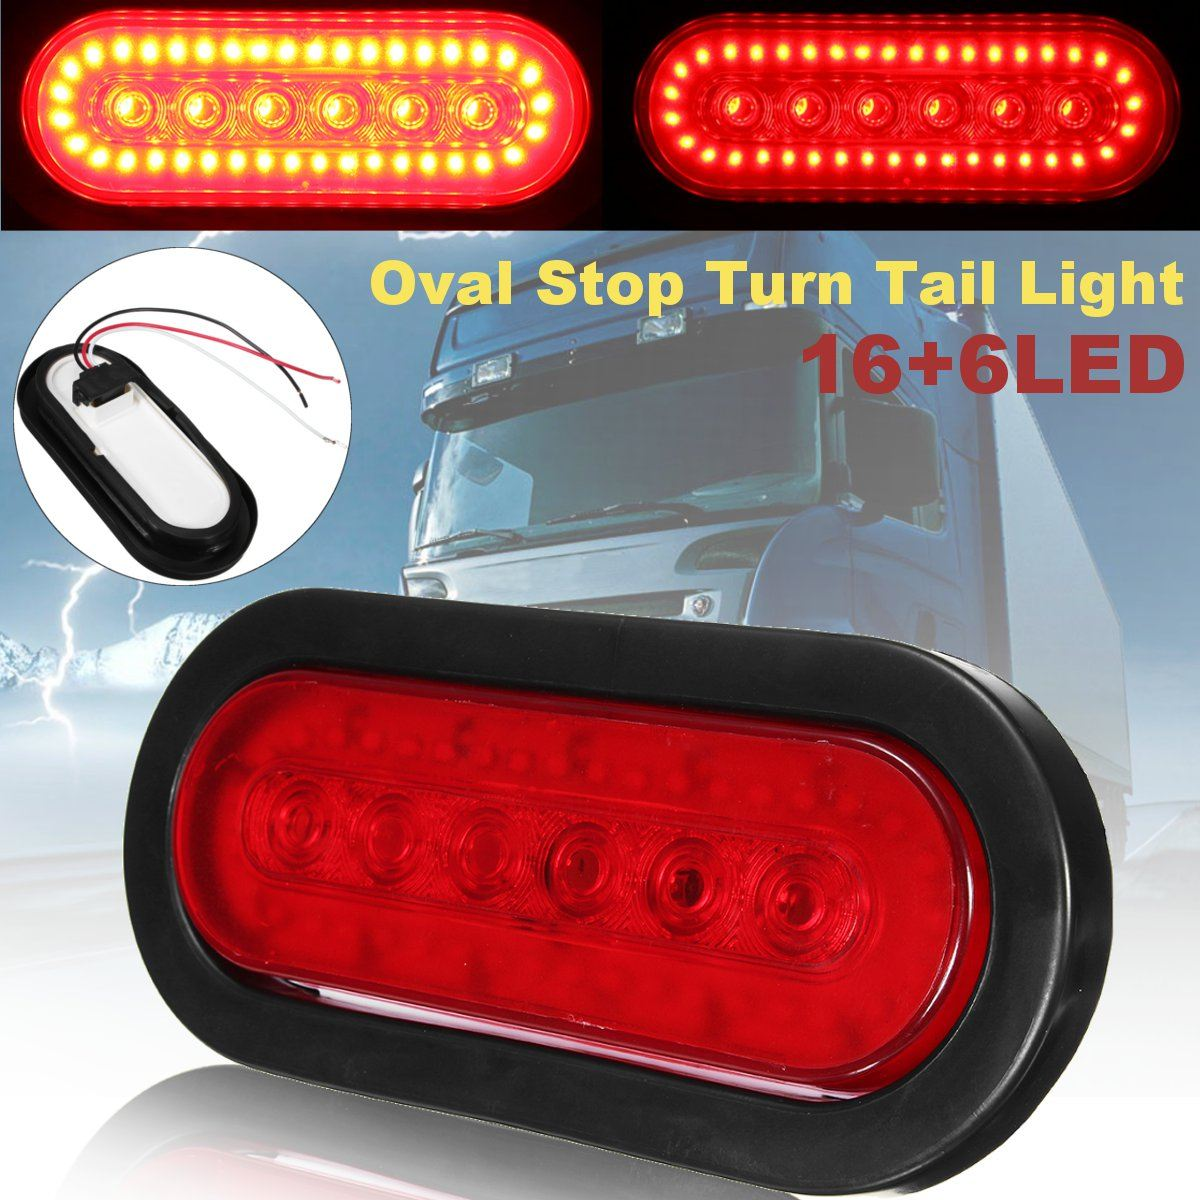 Universal New Red 16+6 LED Car Truck Caravan Van Trailer Lorry Rear Tail Stop Light Lamp